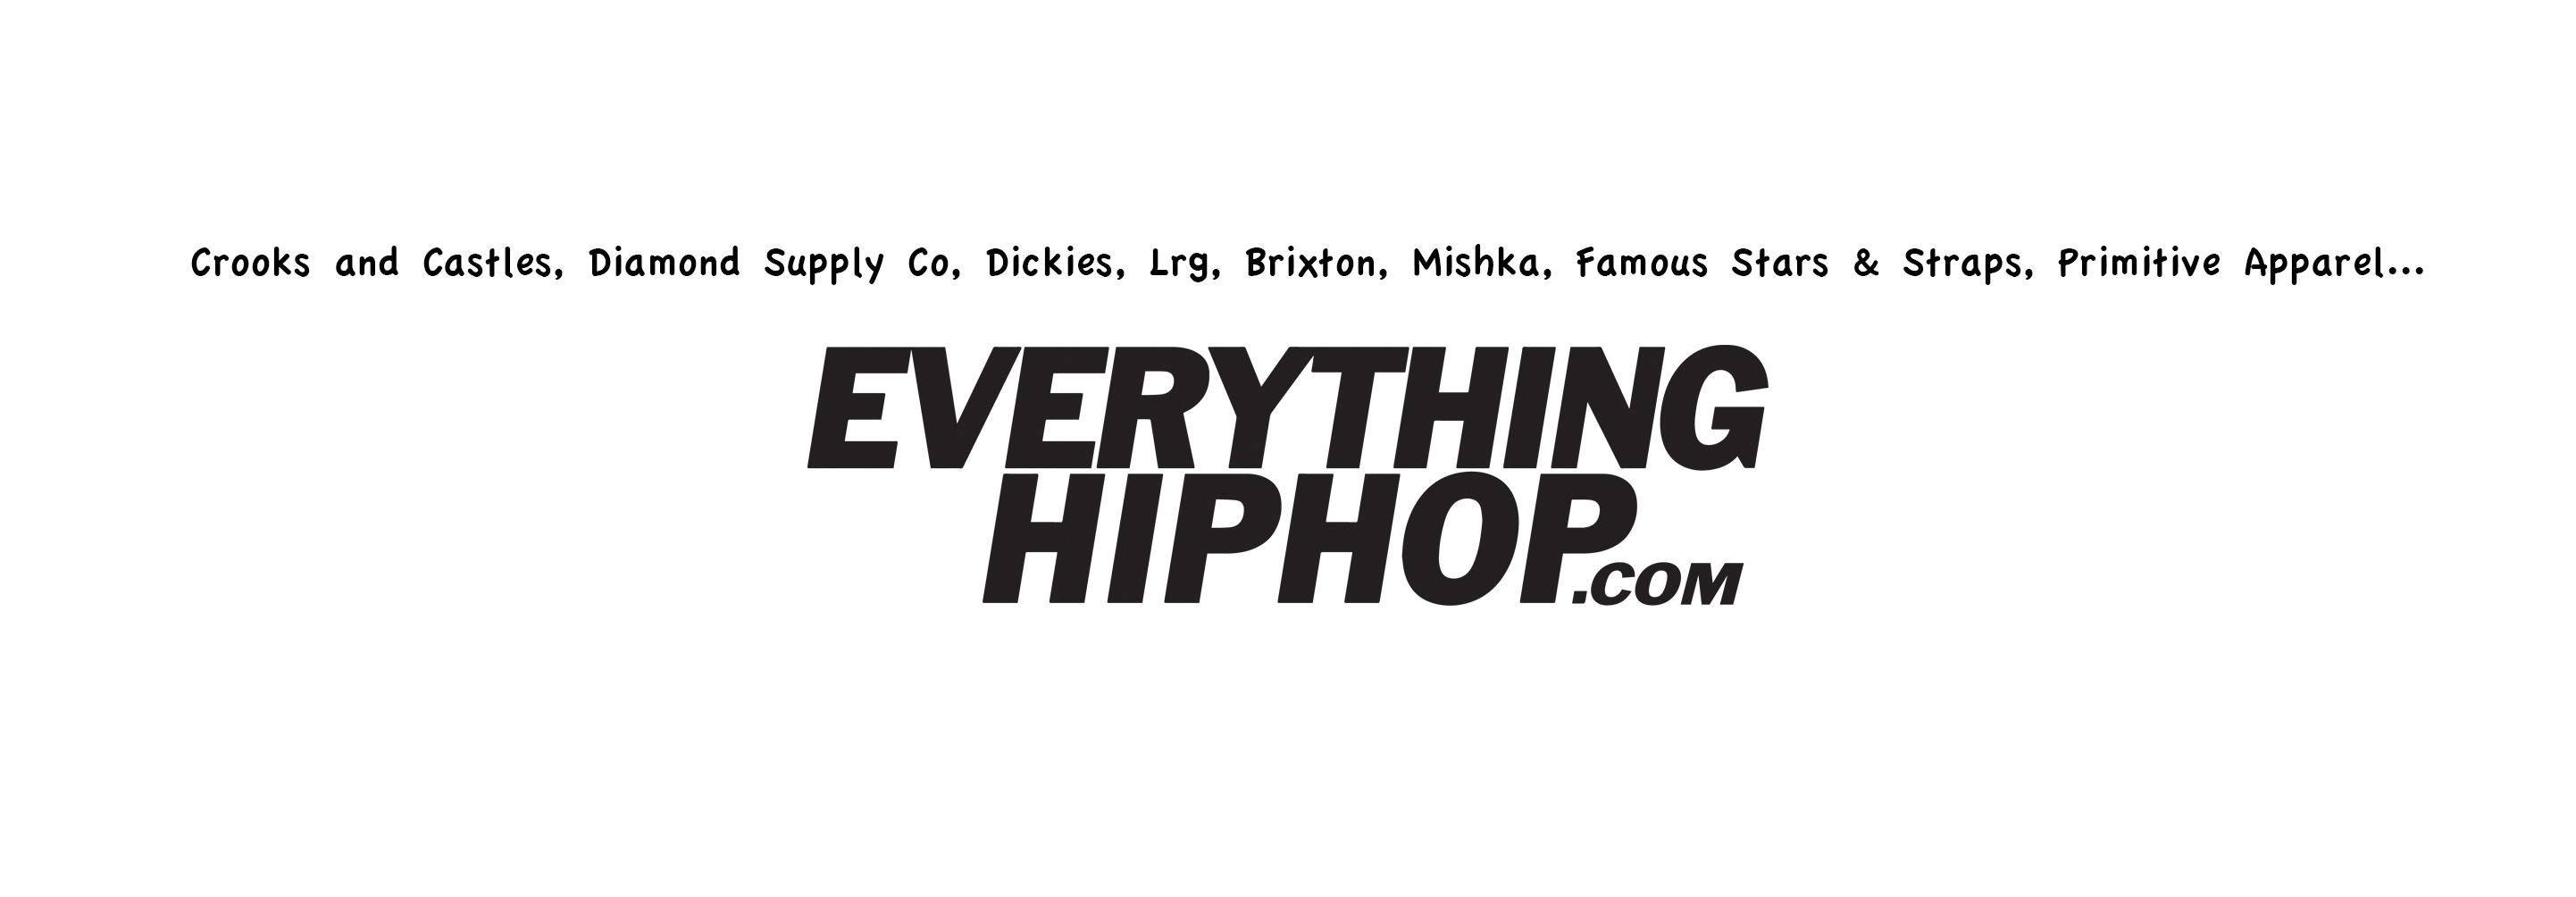 Buy Street Wear Brands | Everythinghiphop.com